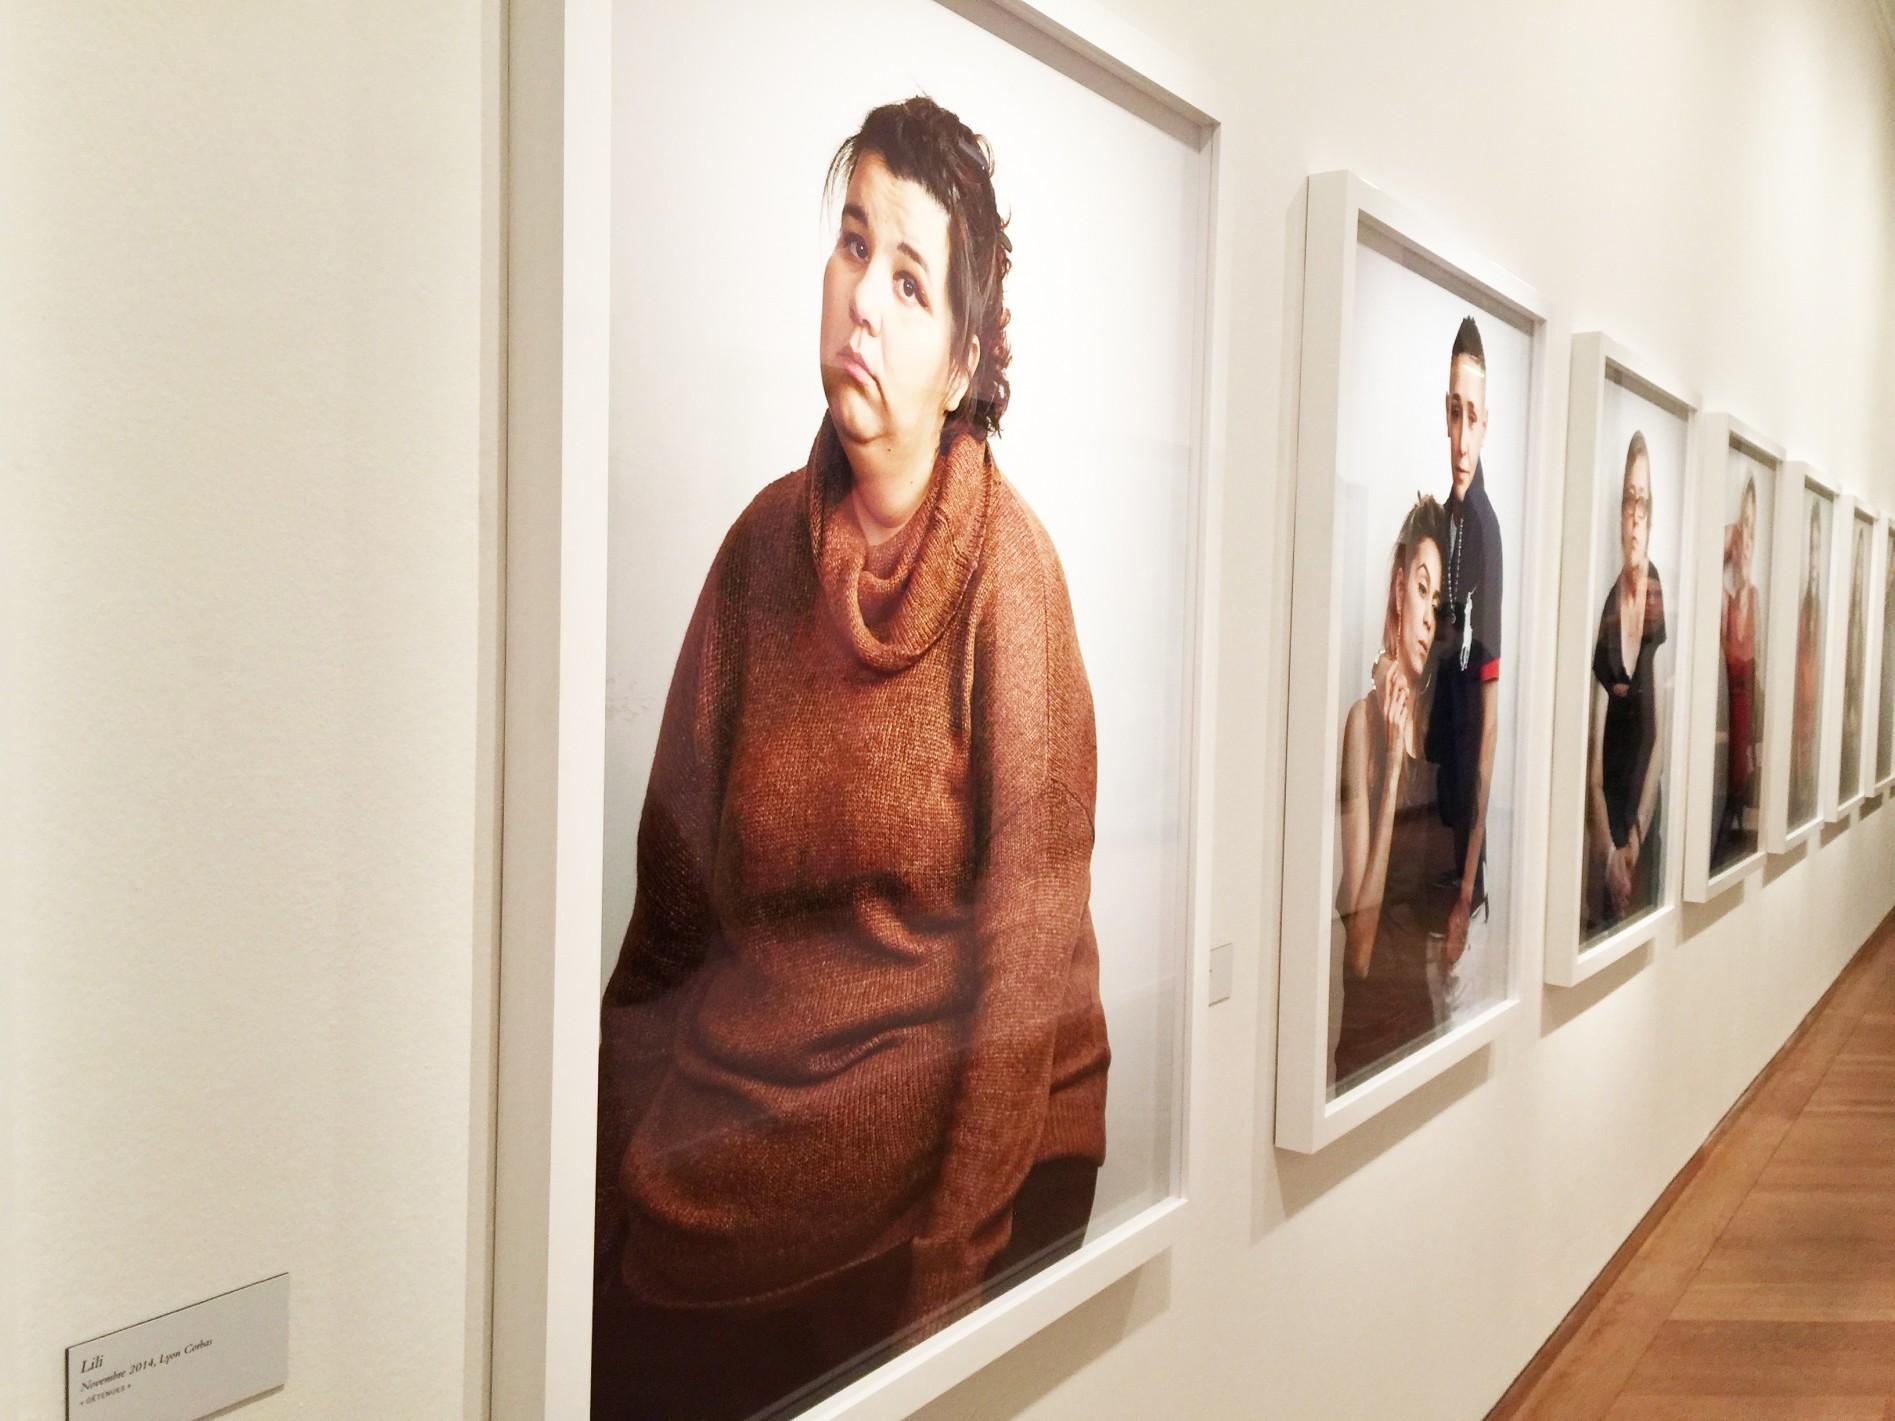 Bettina Rheims expositiont à la MEP Paris